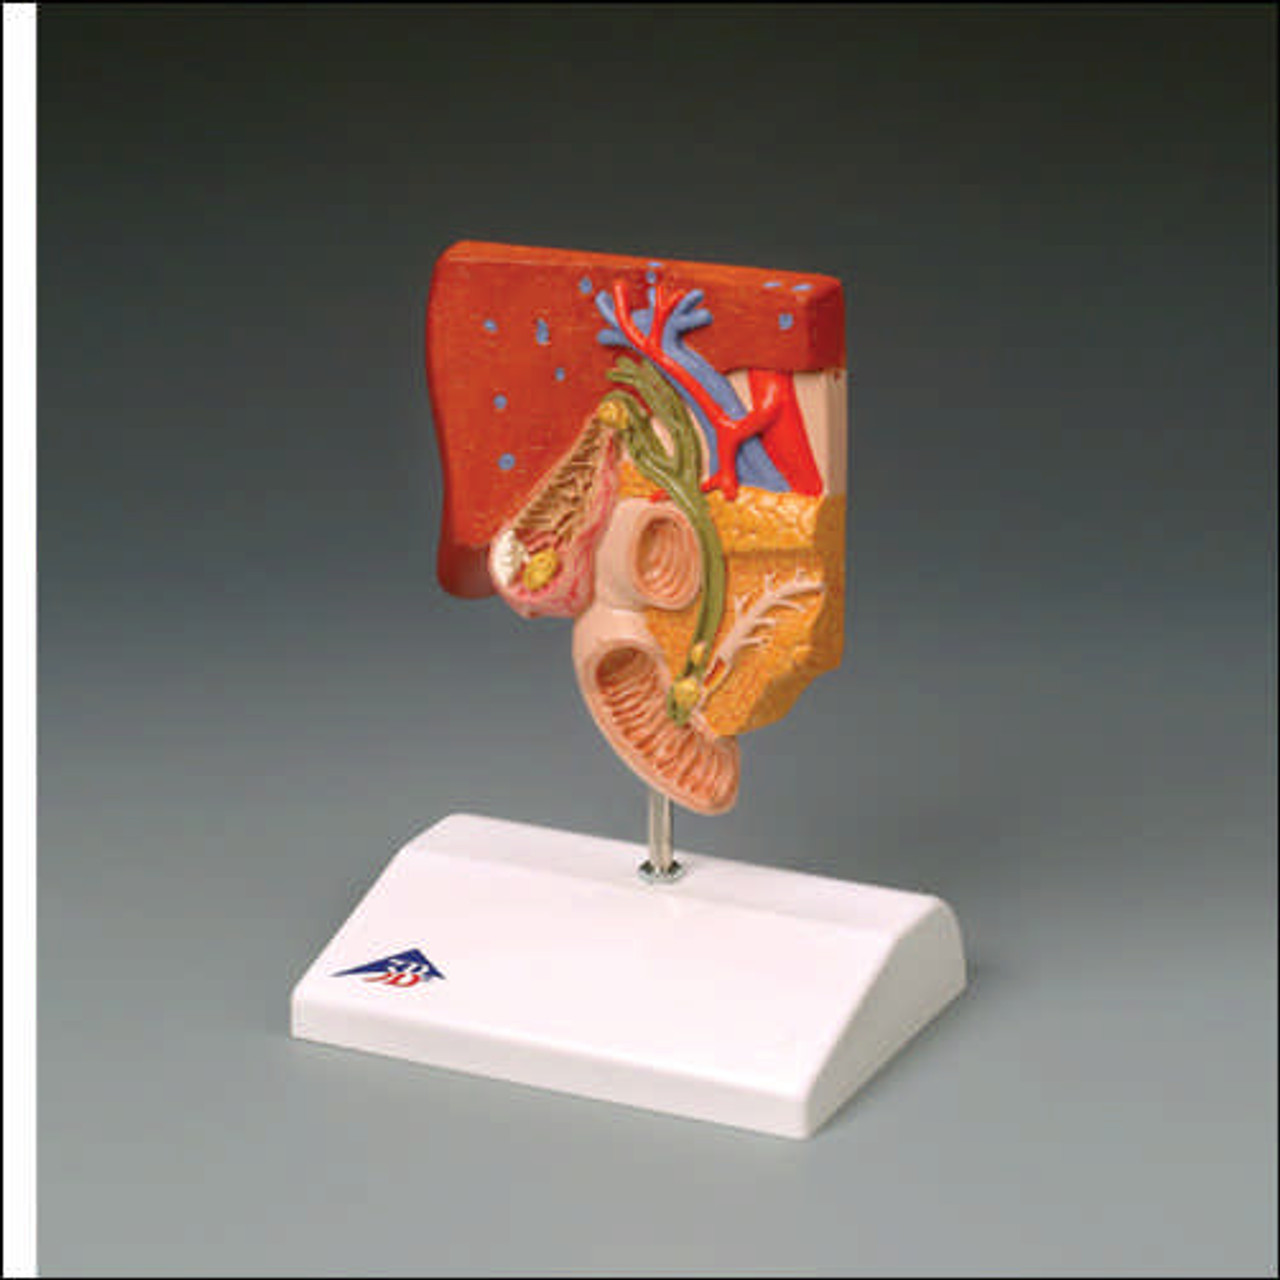 Gallbladder Gallstone Anatomical Model